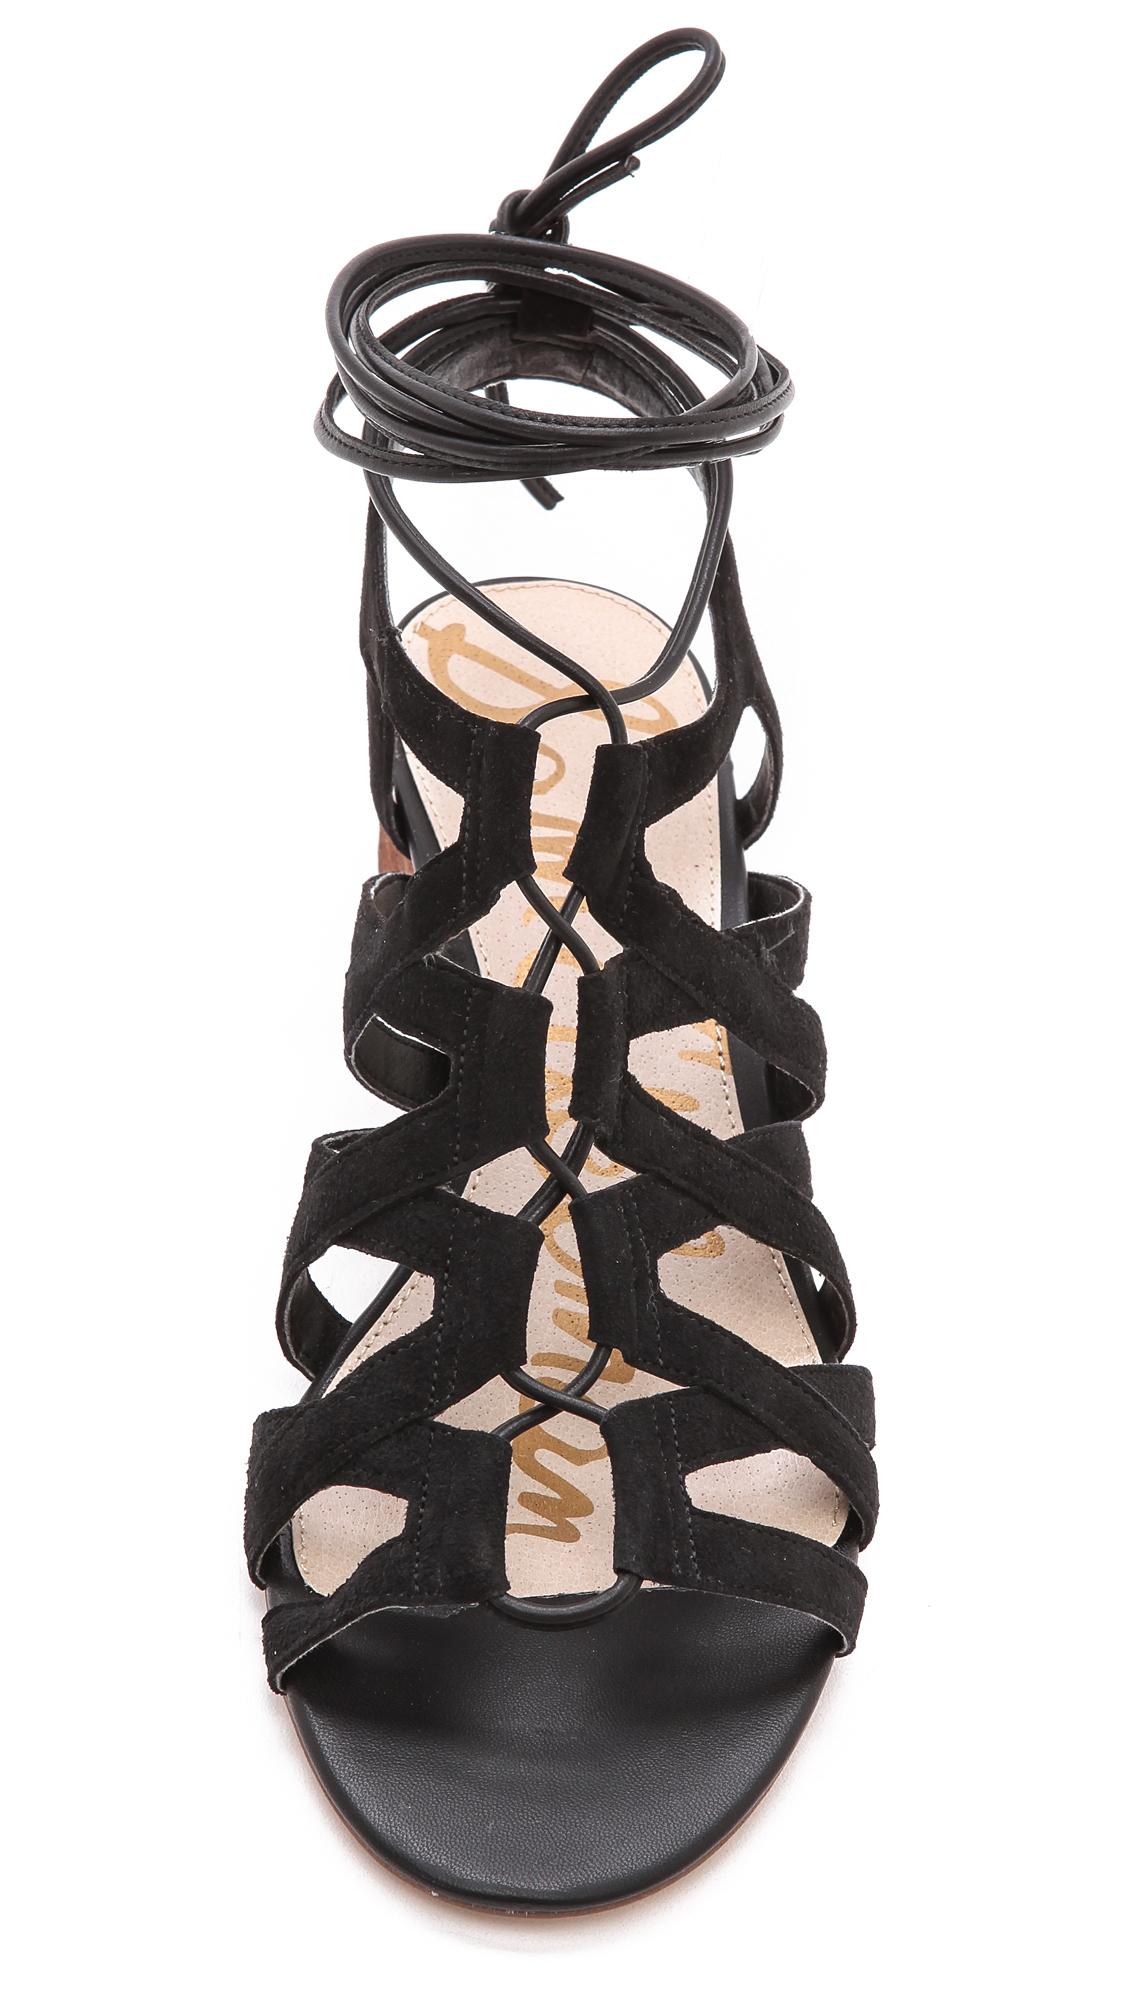 a96af0271e27 Lyst - Sam Edelman Ardella Low Heel Sandals Putty in Black